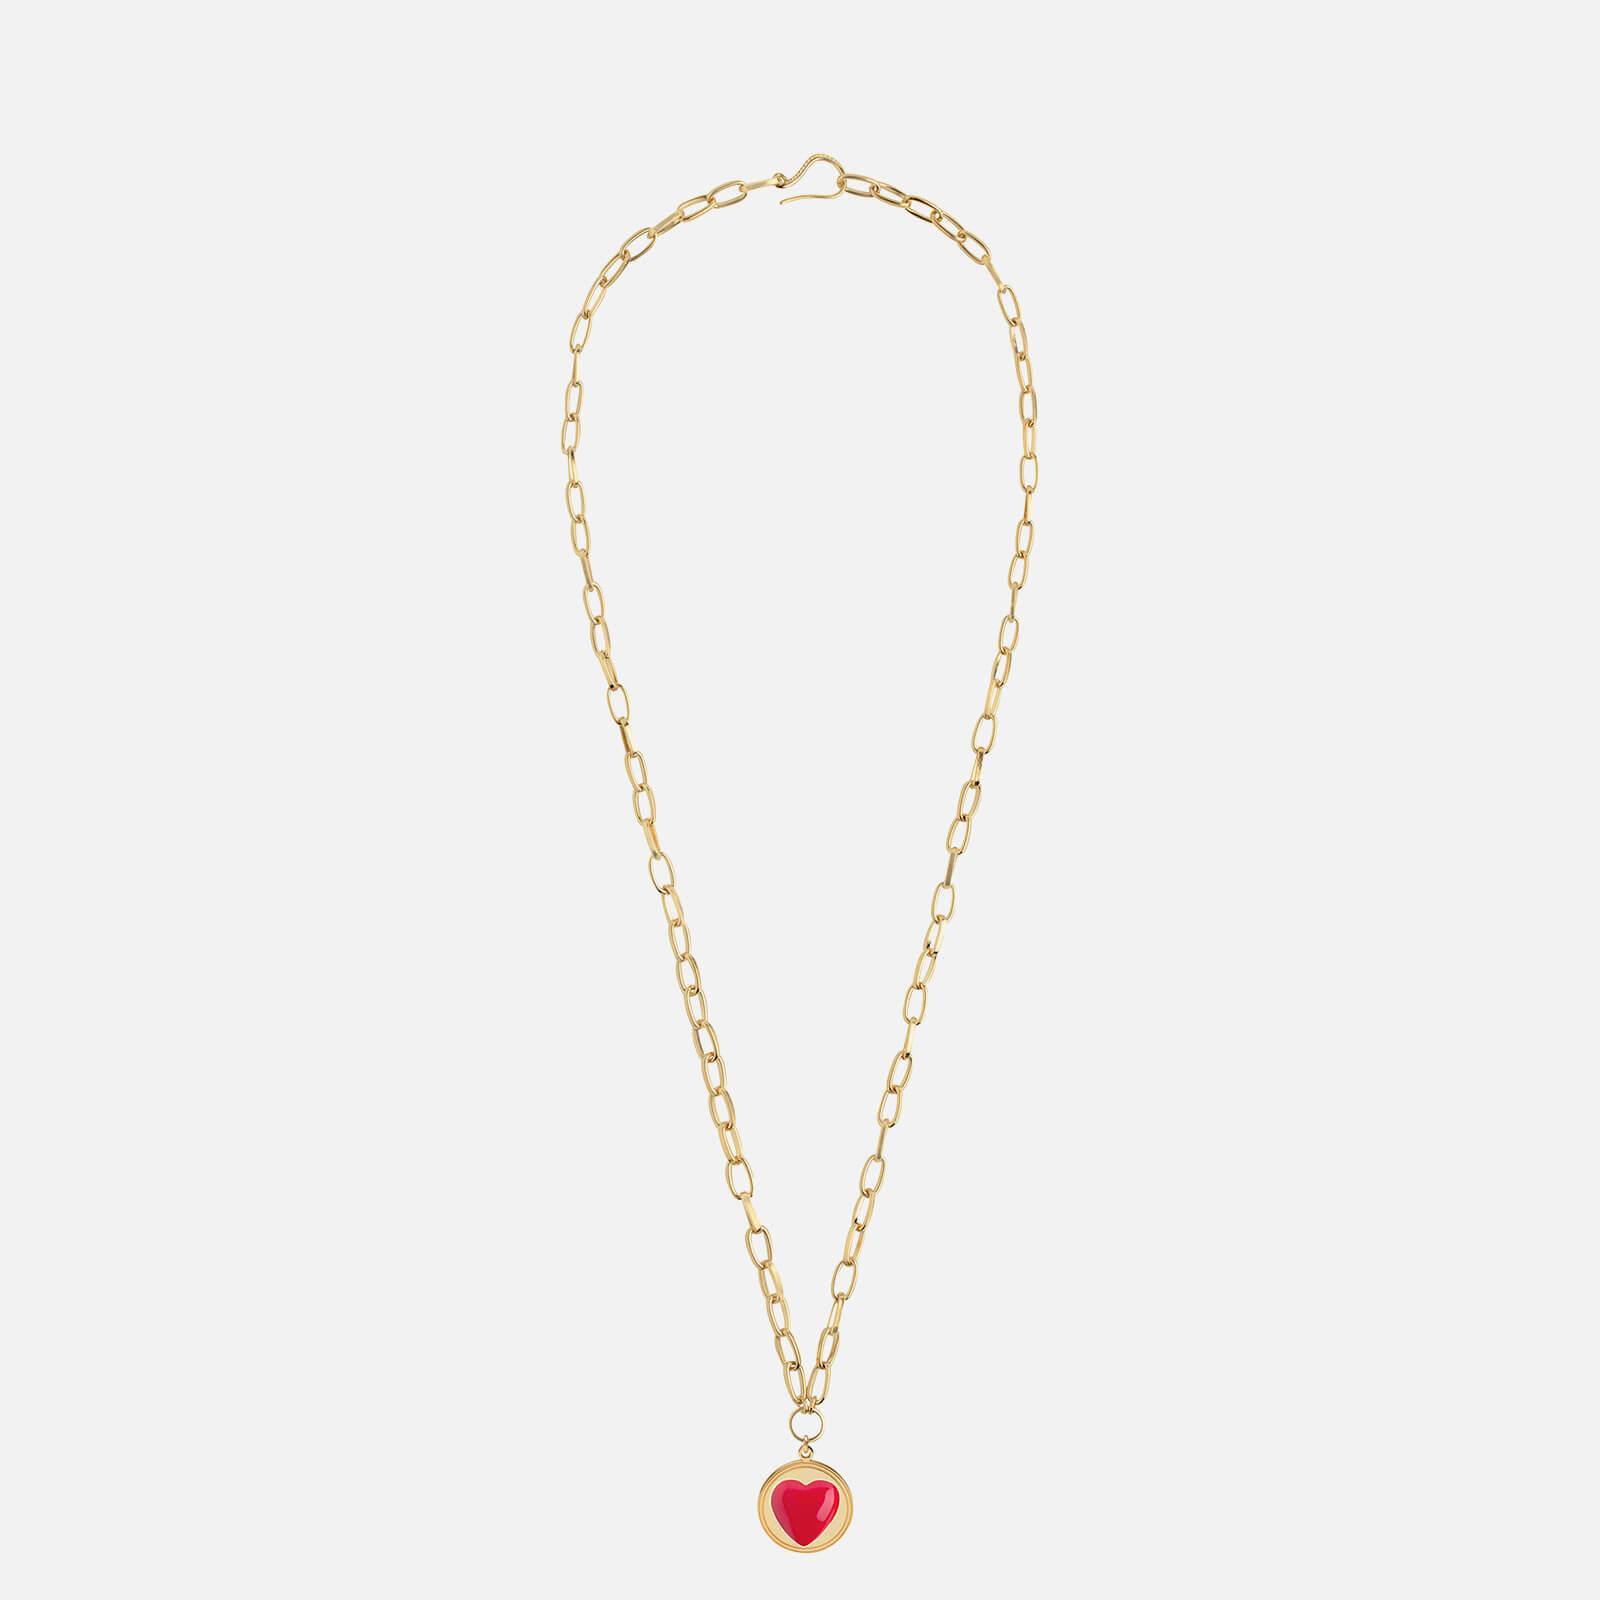 Wilhelmina Garcia Women's Heart Necklace - Gold